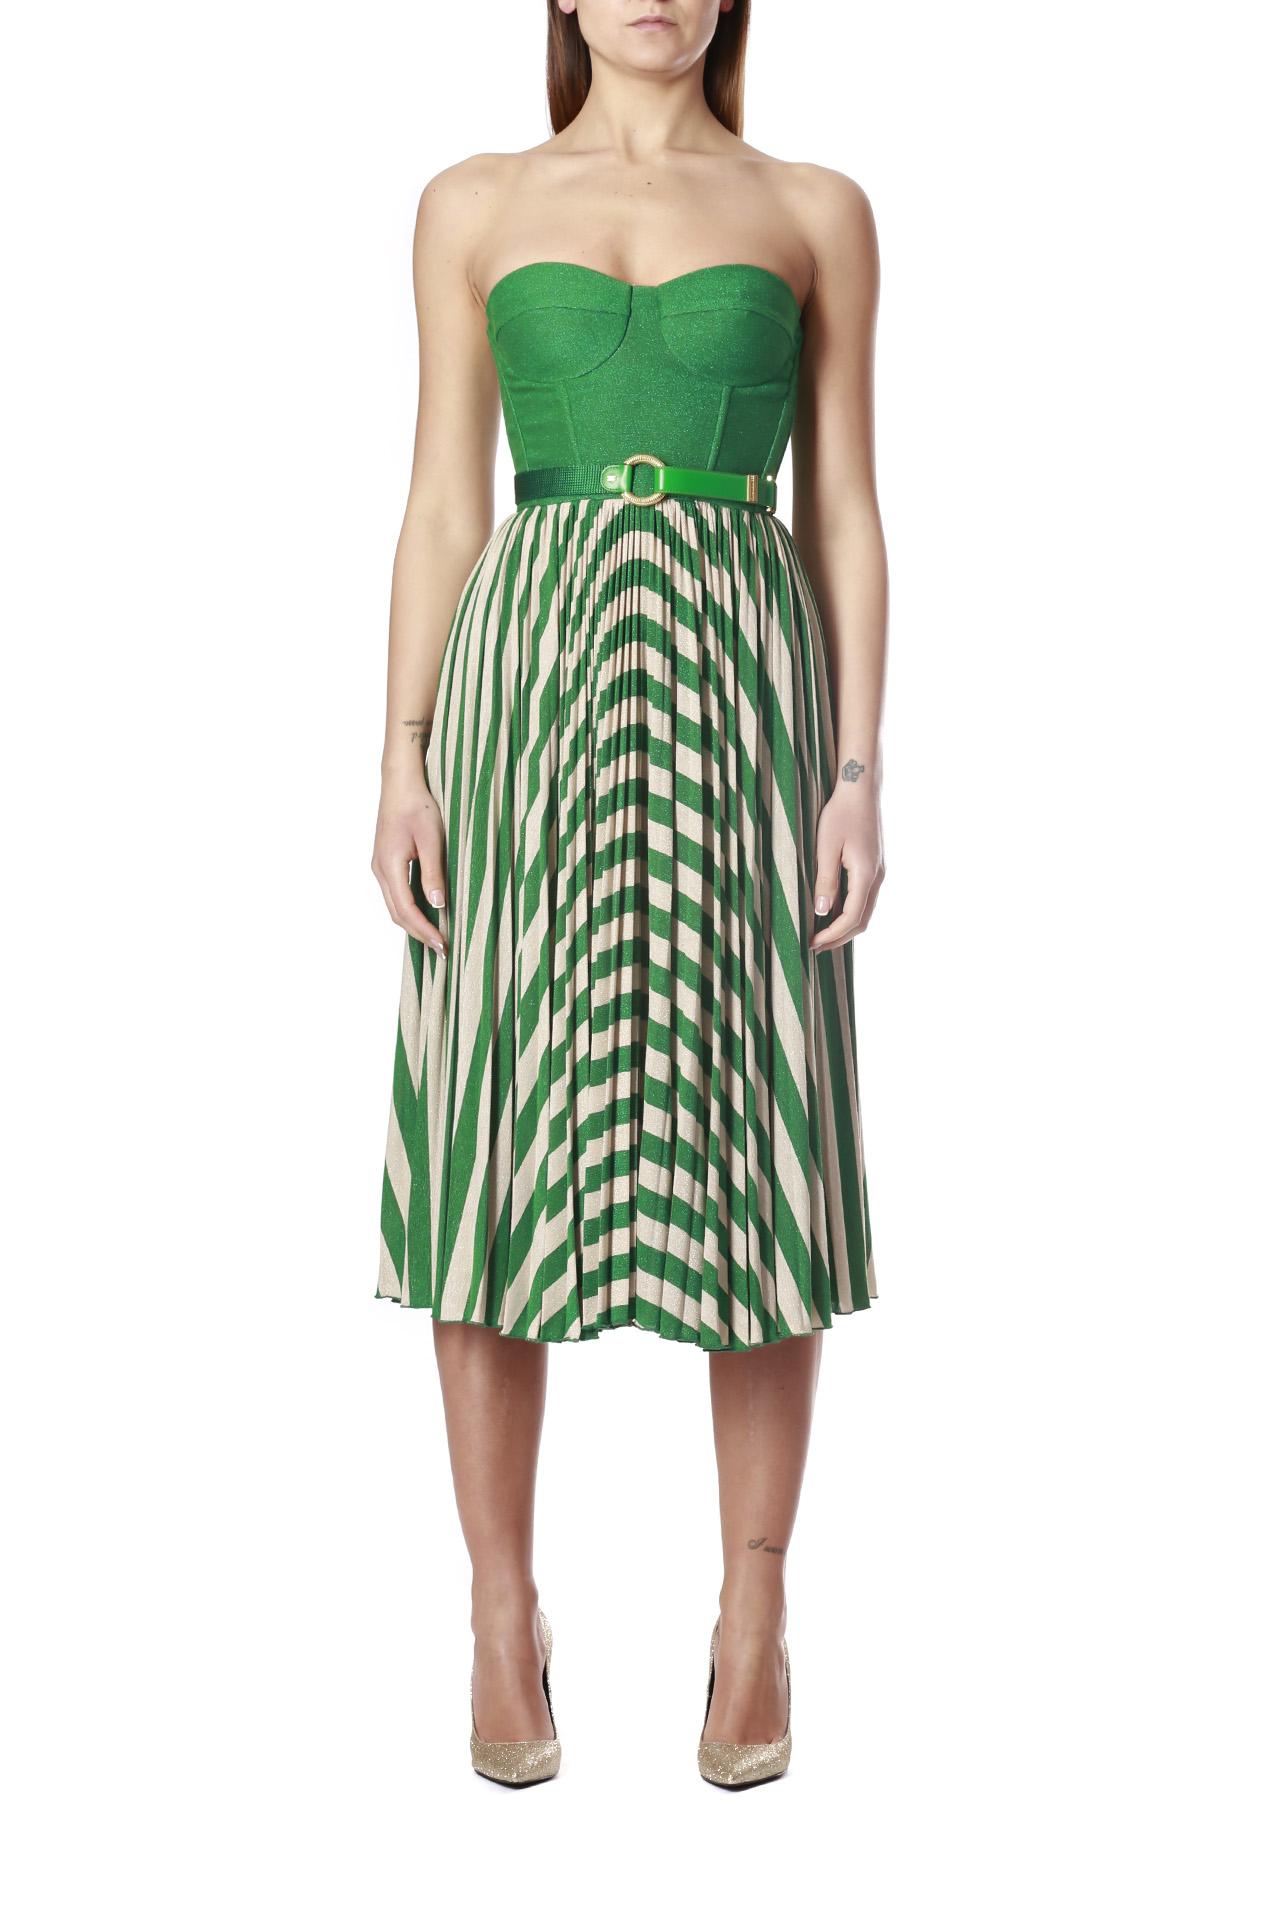 ELISABETTA FRANCHI | Dress | AB18001E2X02